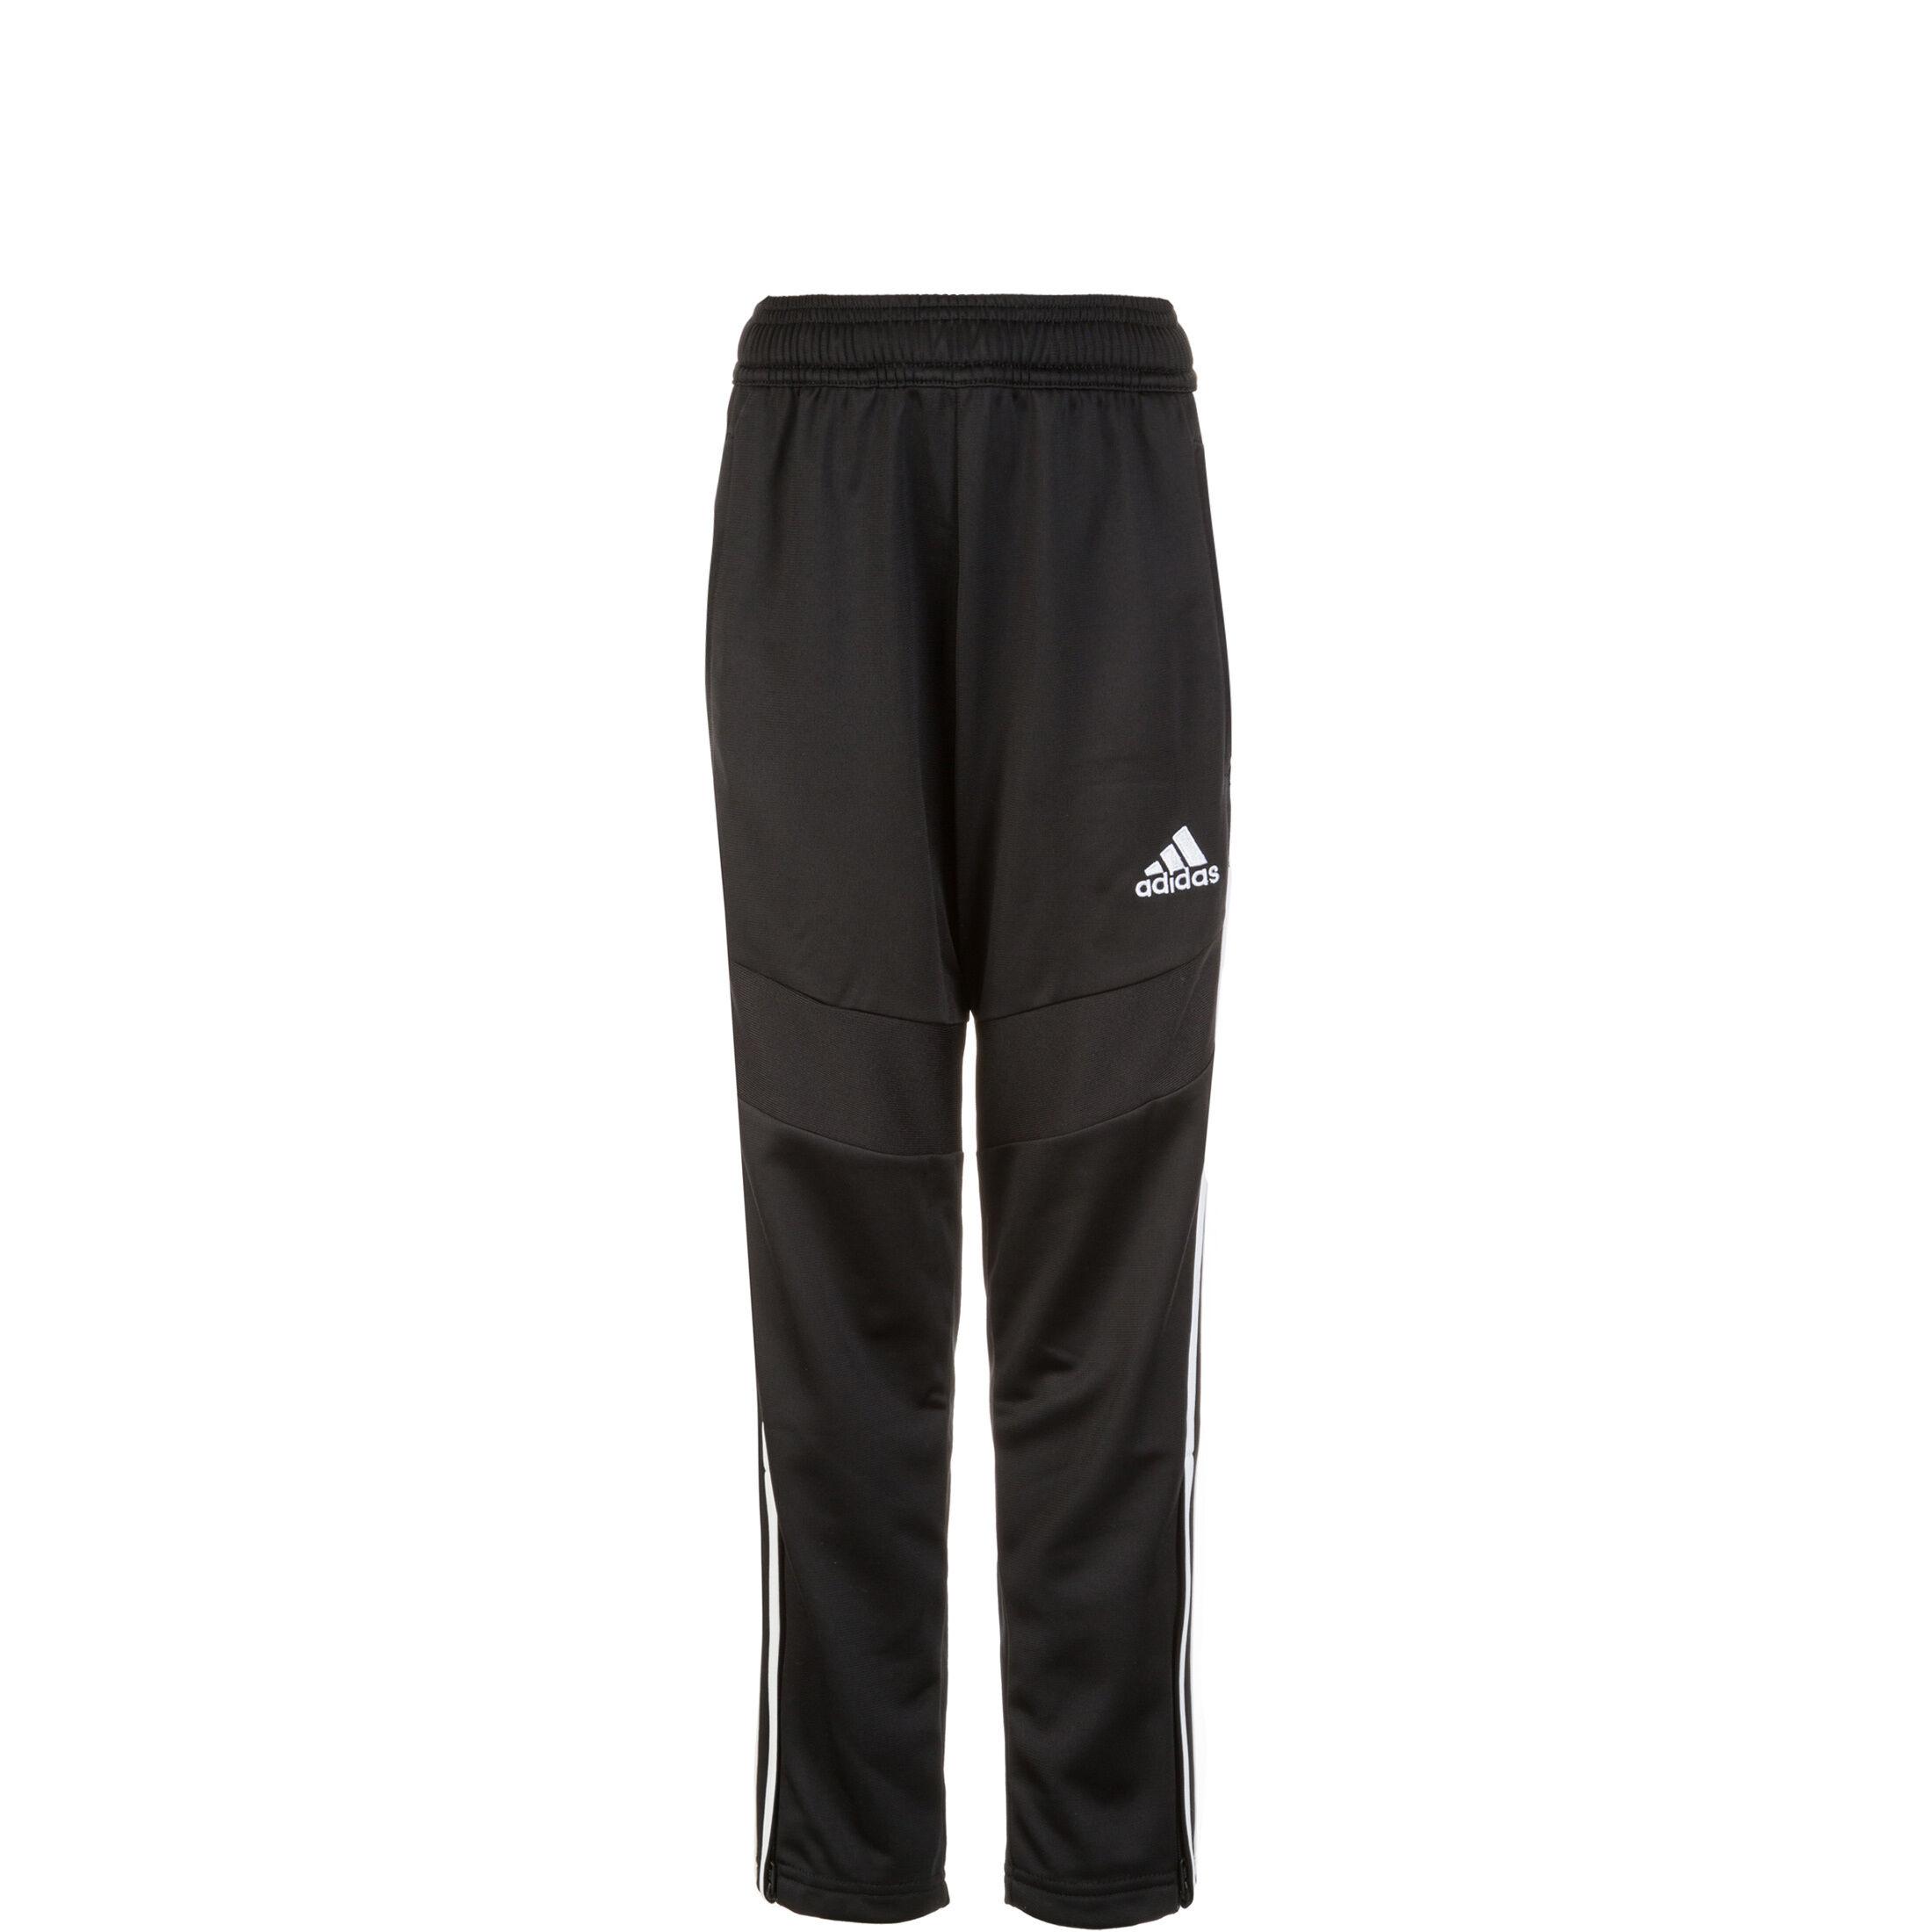 bad0590db54dff 19 Adidas Trainingshose Tiro Kinder Outfitter Bei Performance qzFUzwxC8